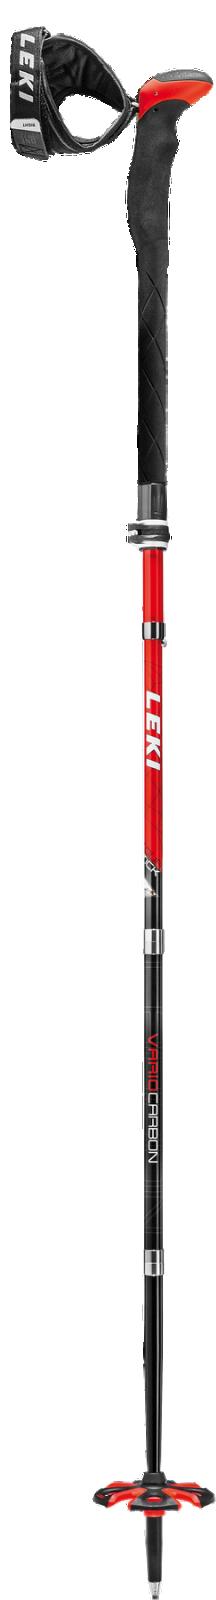 Leki Tour Stick Vario Carbon V